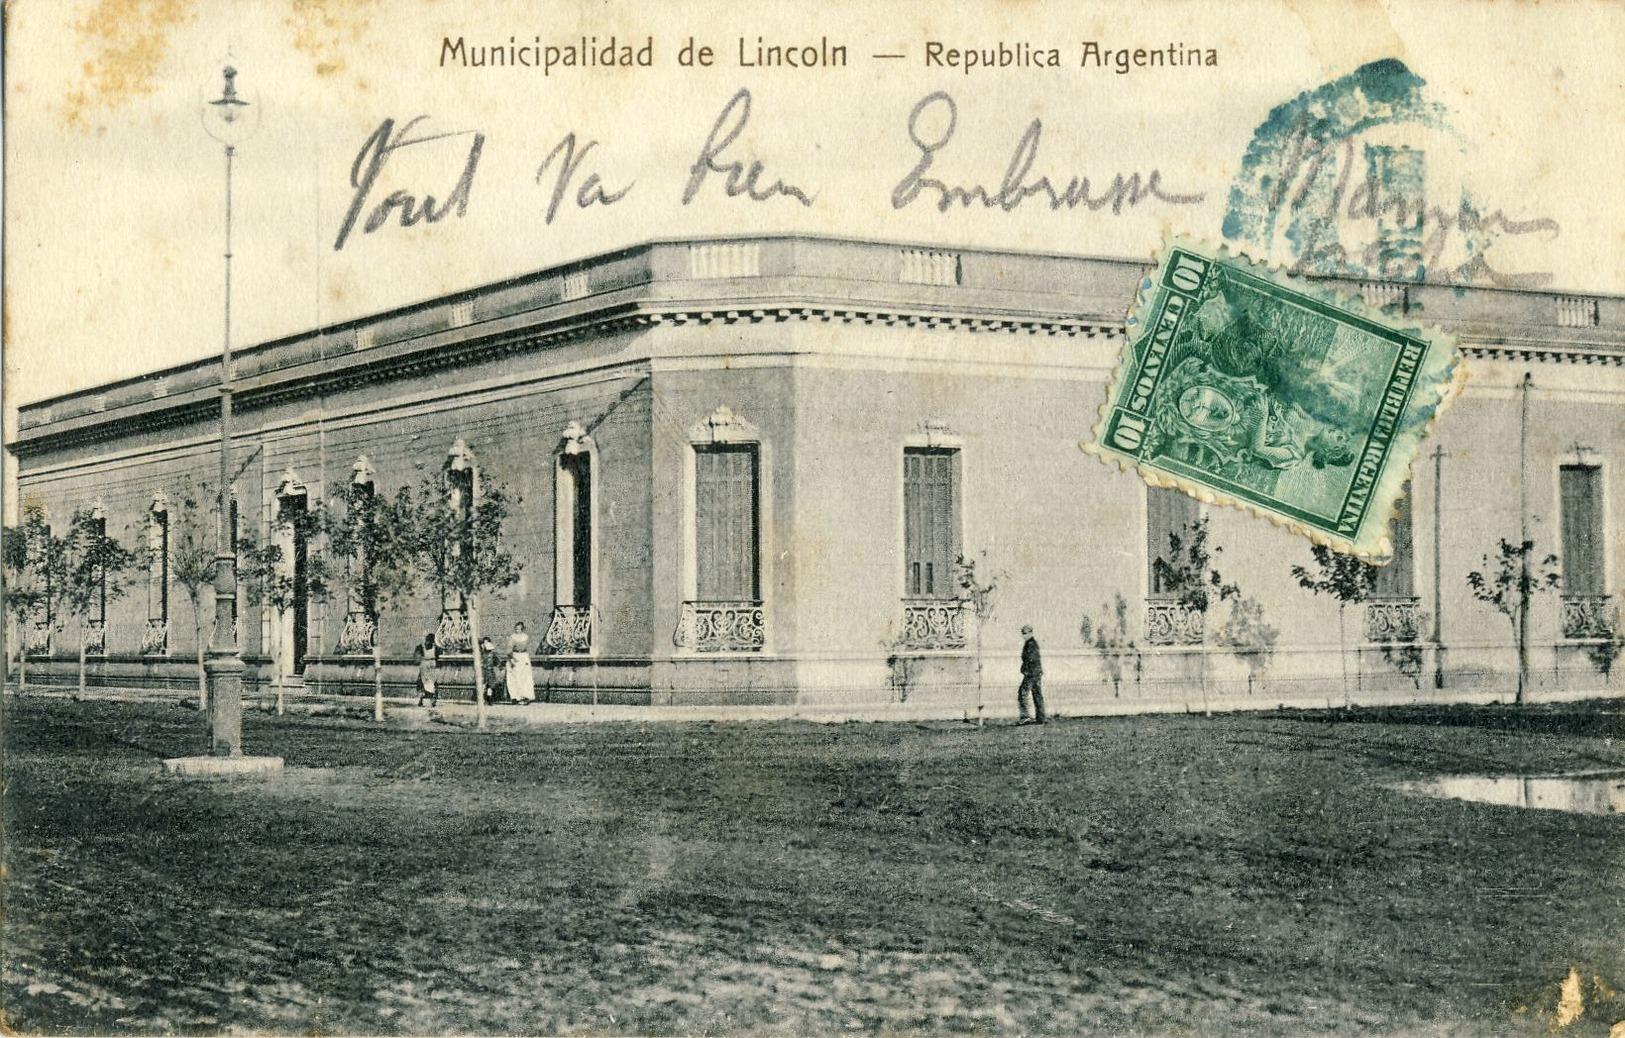 MUNICIPALIDAD  De  LINCOLN,  REPUBLICA  ARGENTINA - Argentinië